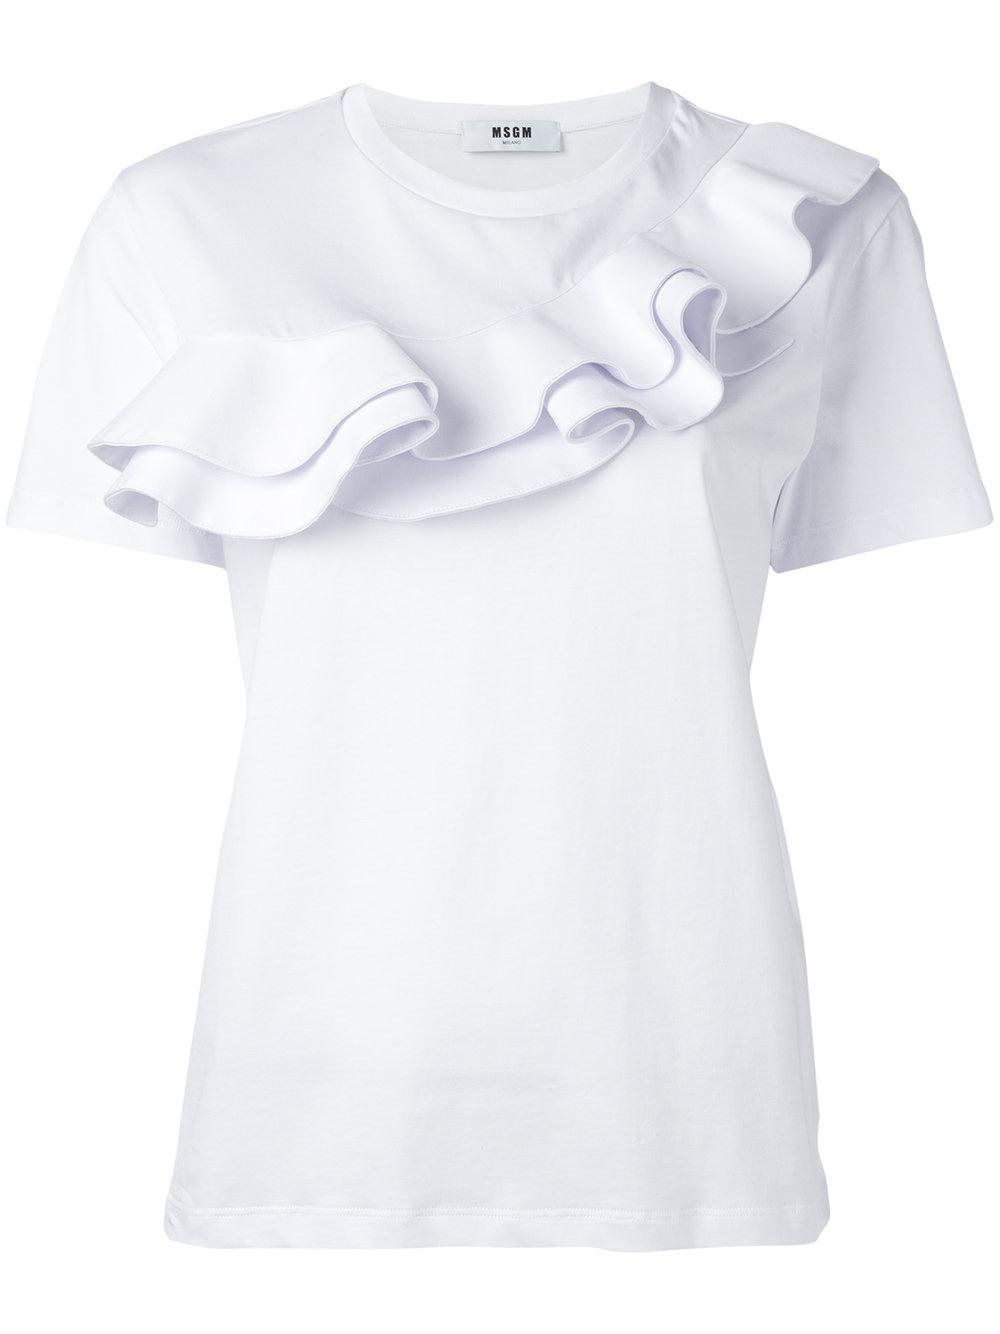 MSGM Ruffle Detailed T Shirt White FASHION STYLE FAN